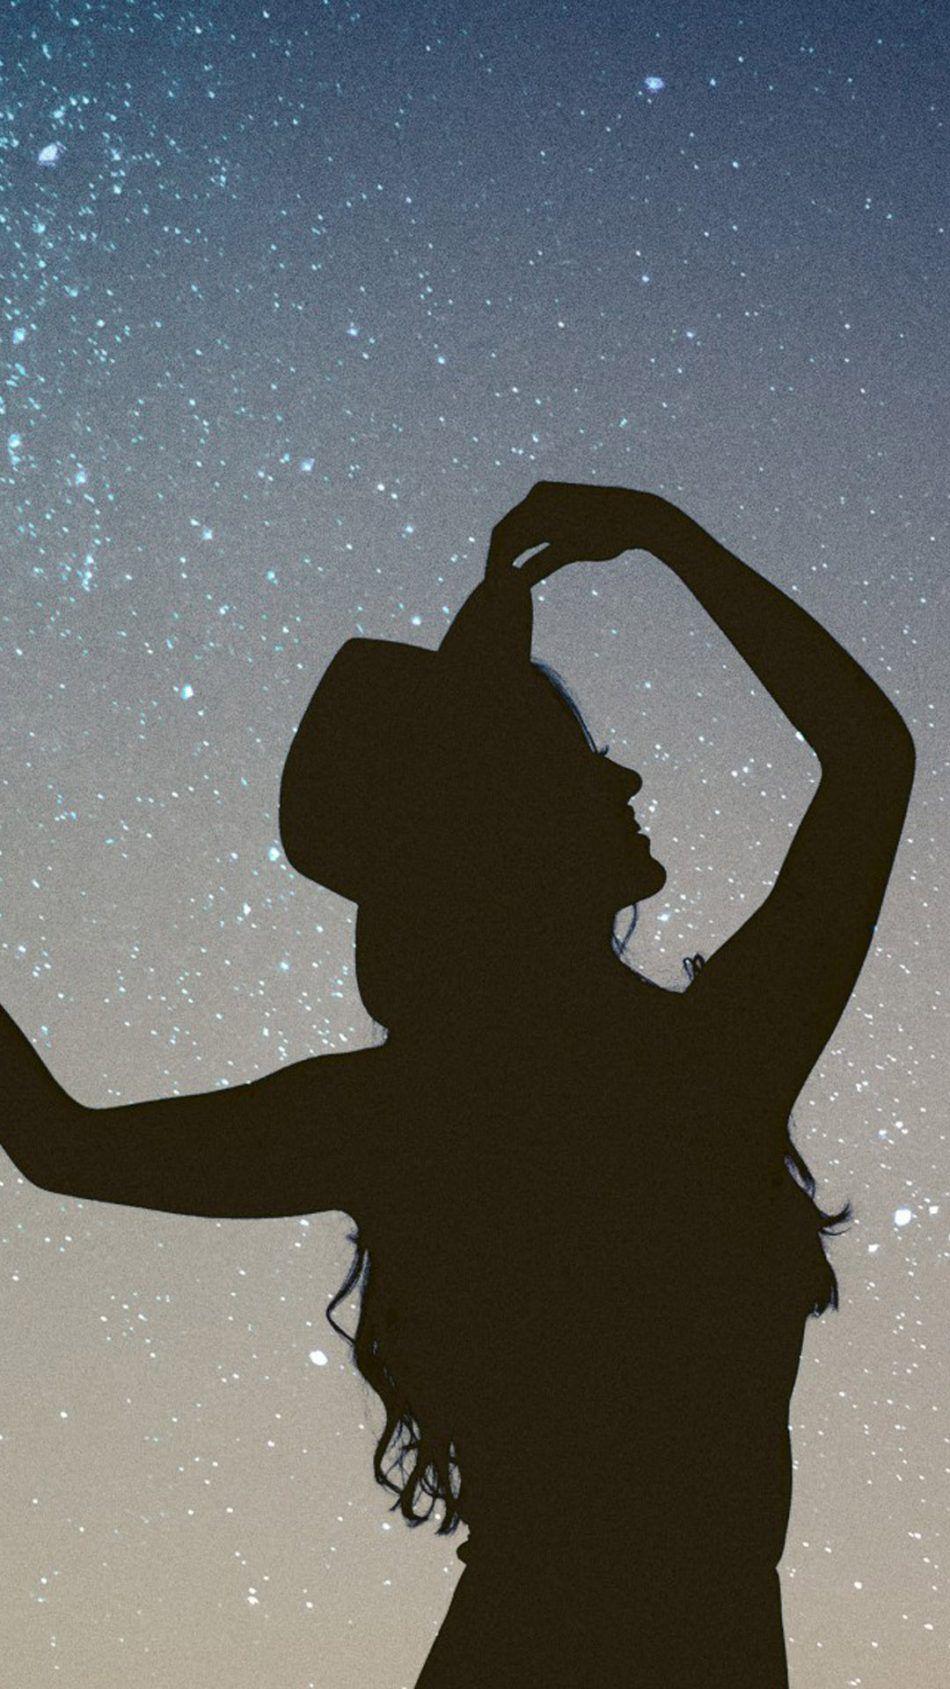 Silhouette Girl Starry Sky 4k Ultra Hd Mobile Wallpaper Girl Silhouette Silhouette Starry Sky